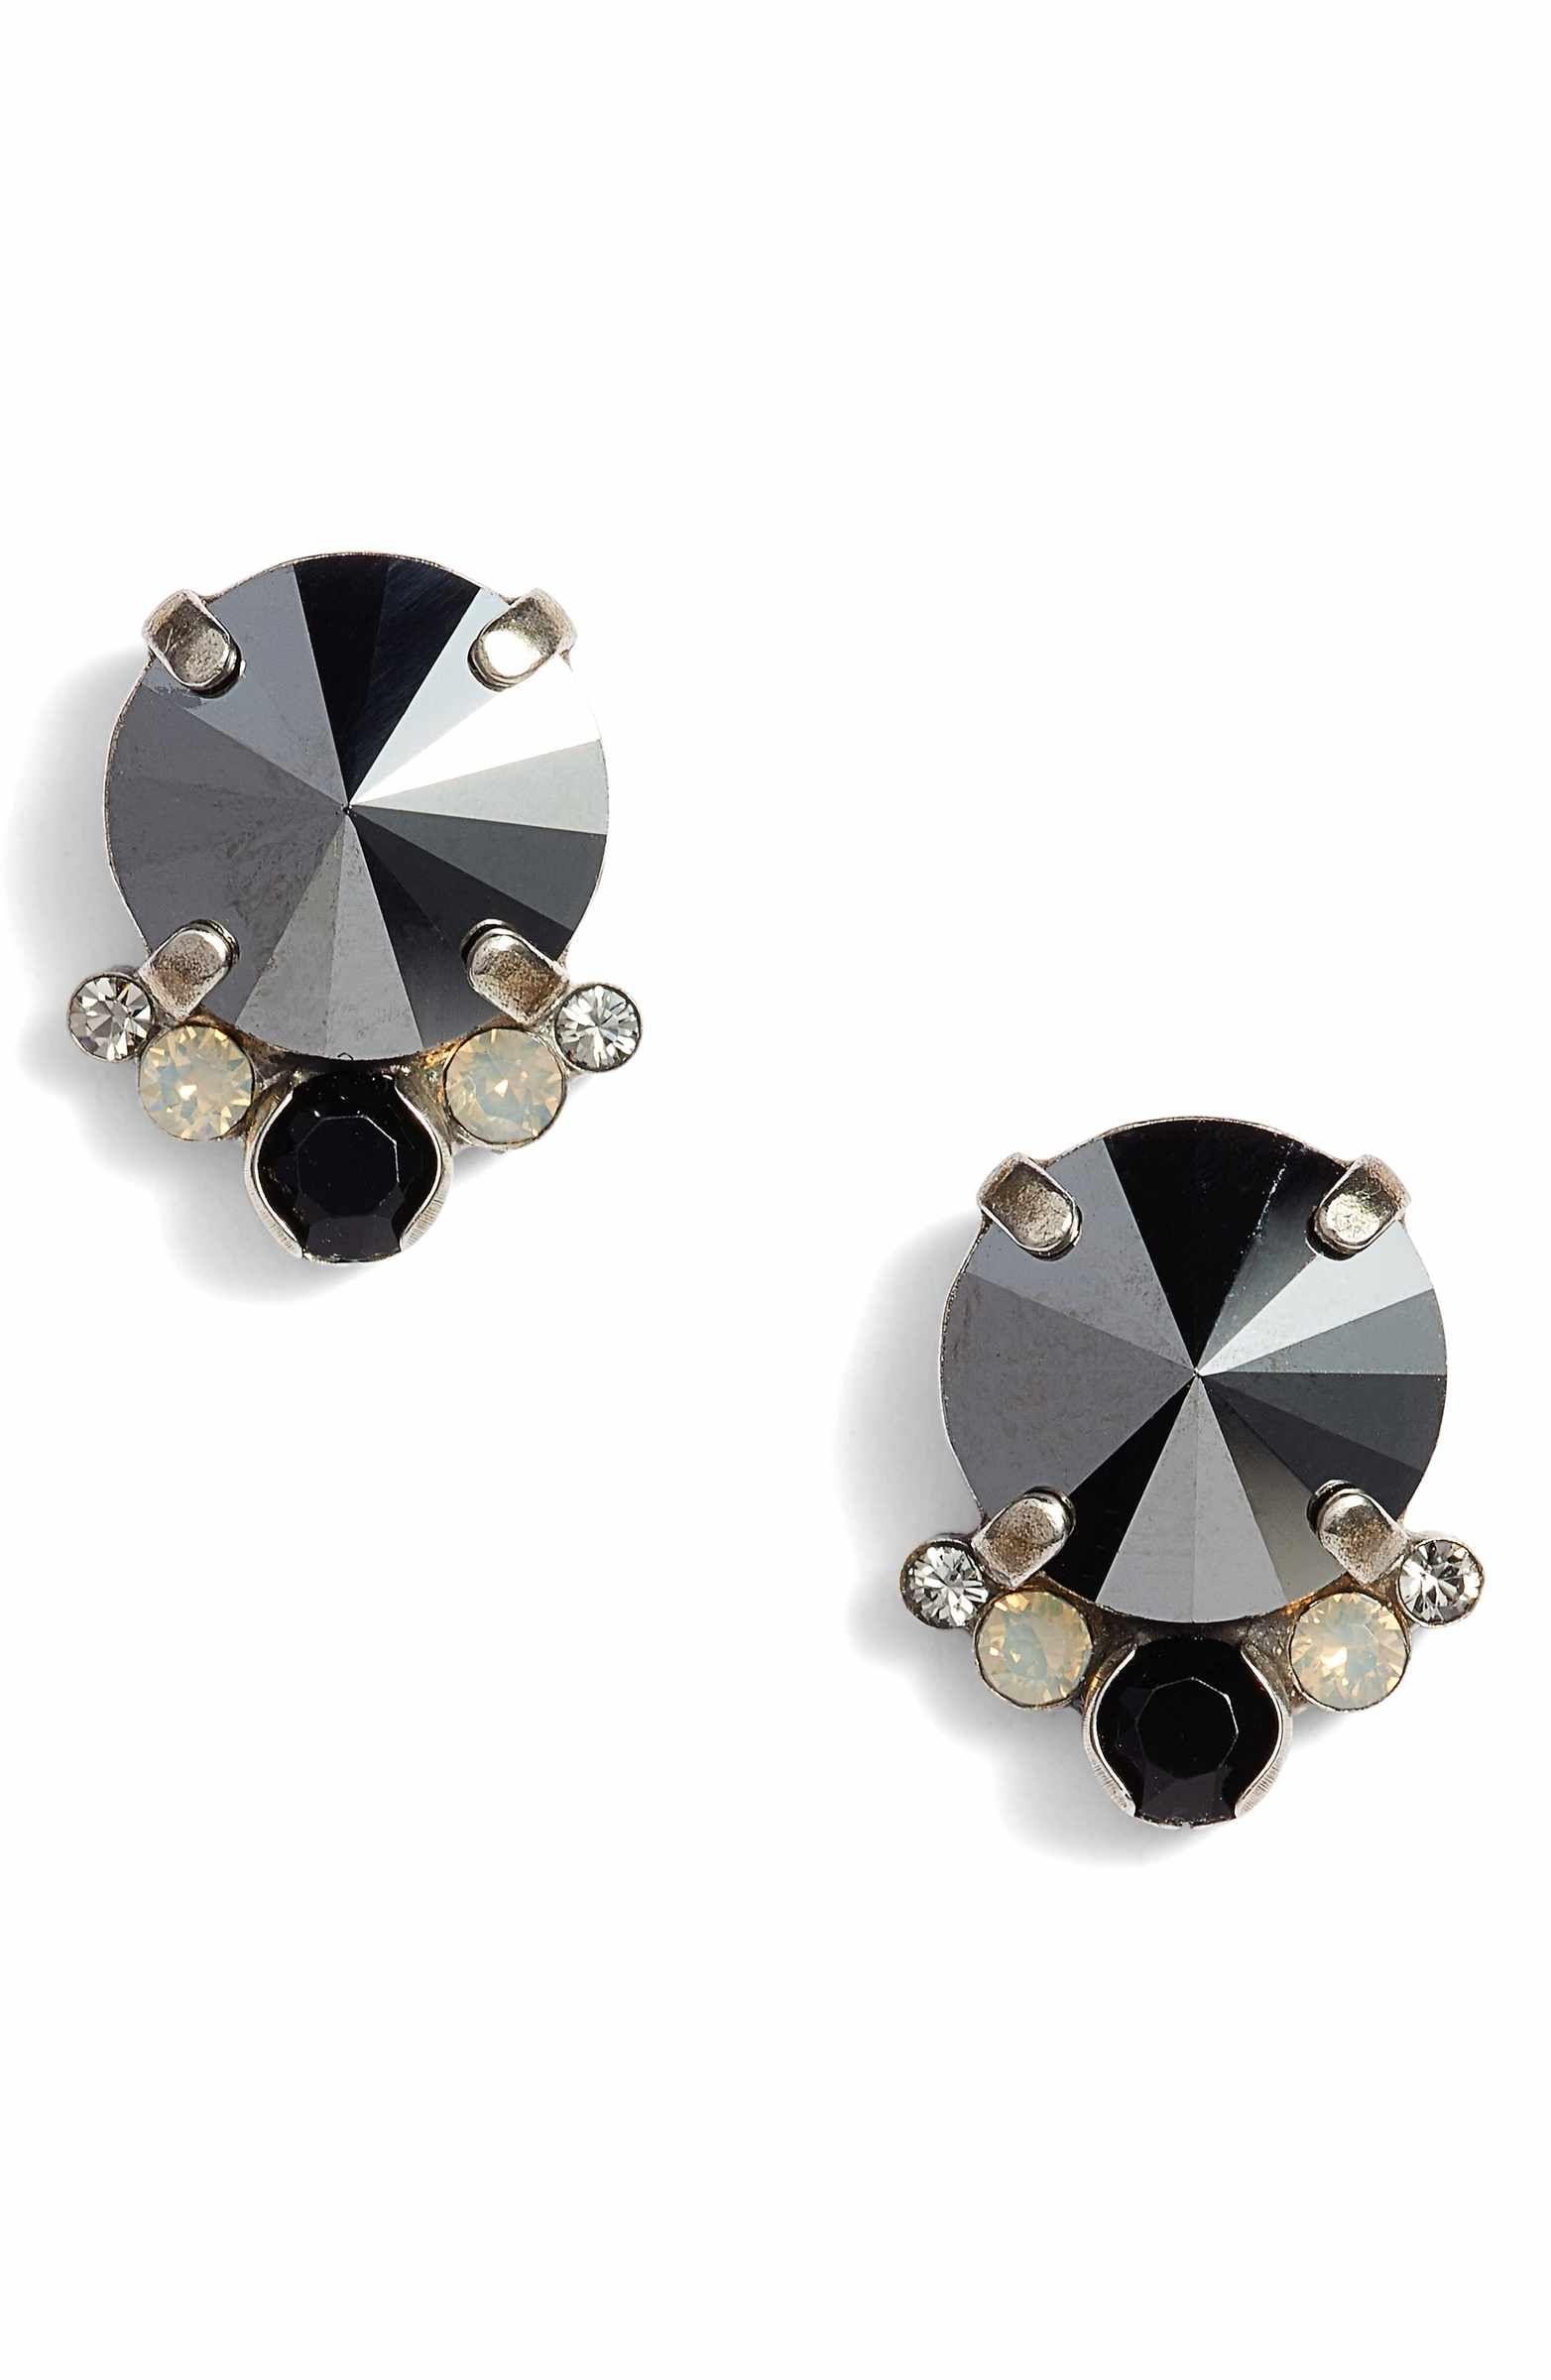 f7d44ffb3 Main Image - Sorrelli Regal Crystal Stud Earrings | Wantable, Stitch ...